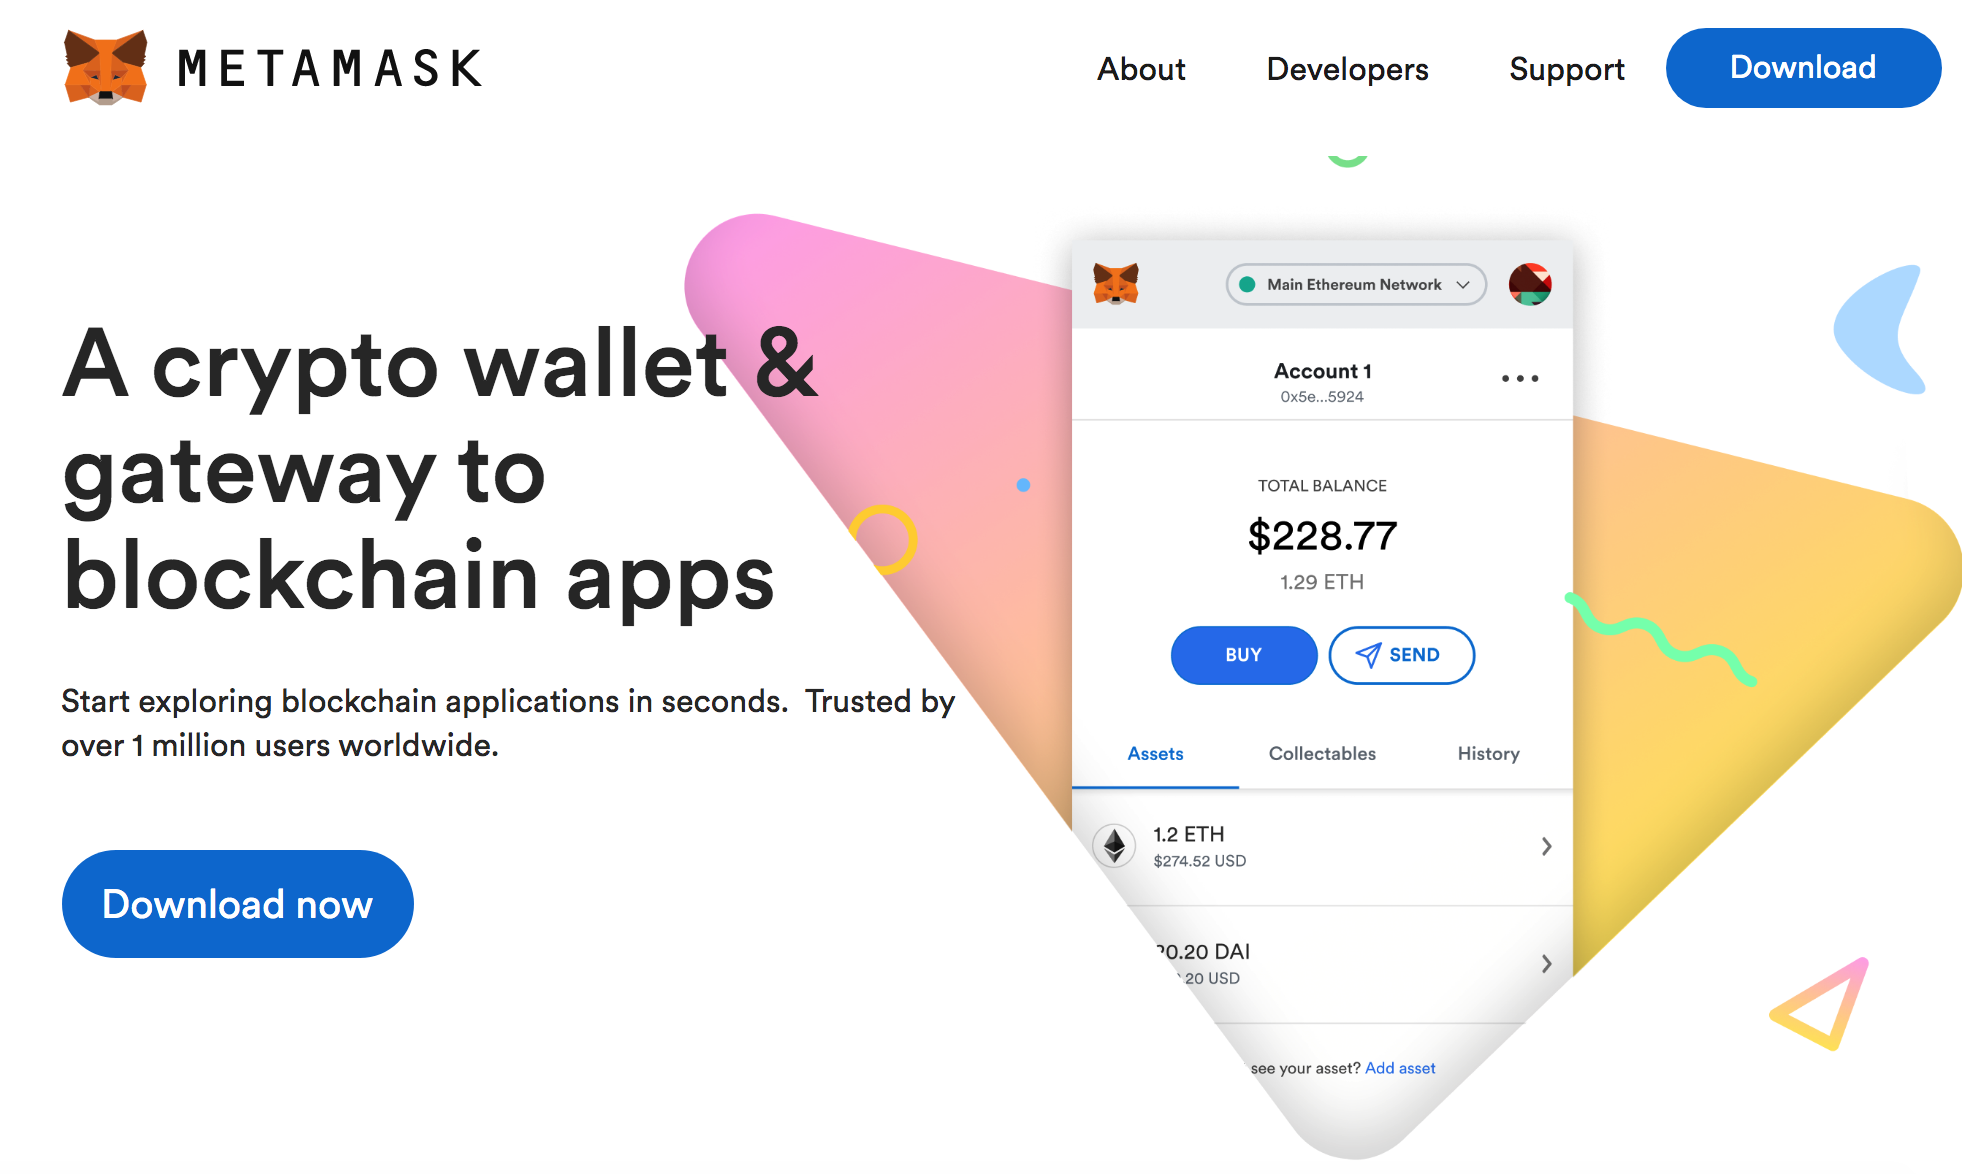 MetaMask wallet for ETH